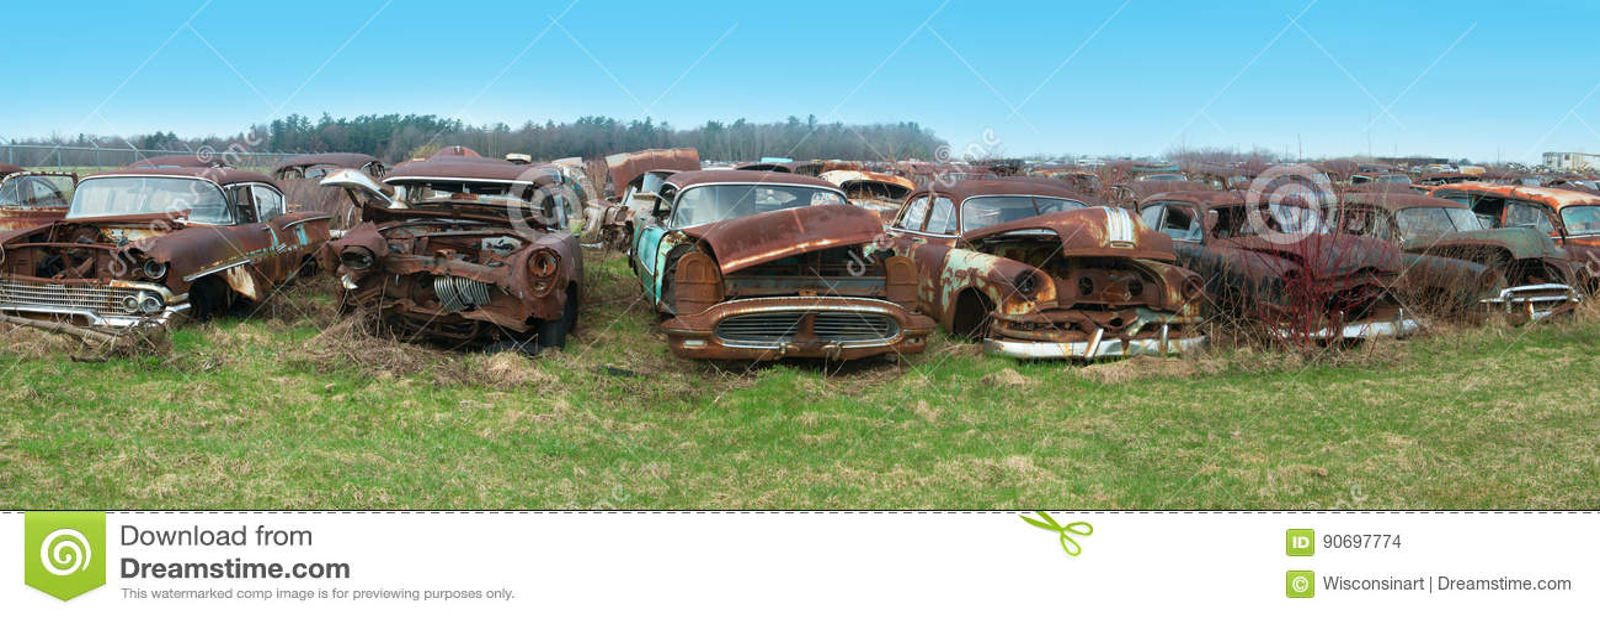 Old Classic Car, Cars, Junkyard